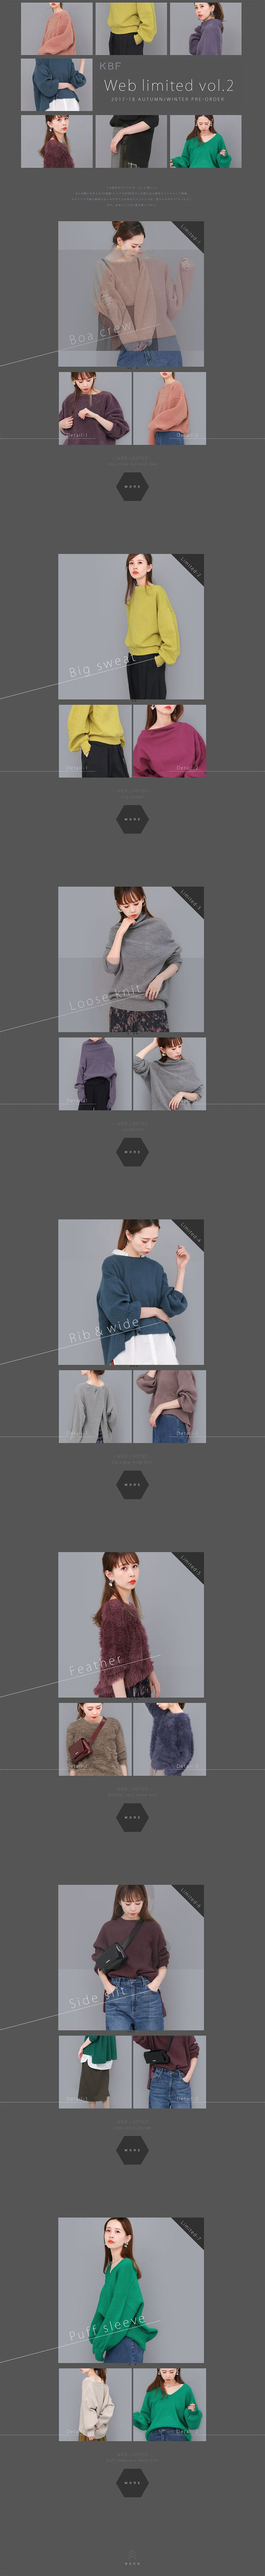 KBF様の「KBF+Web+limited+vol.2」のランディングページ(LP)シンプル系|ファッション